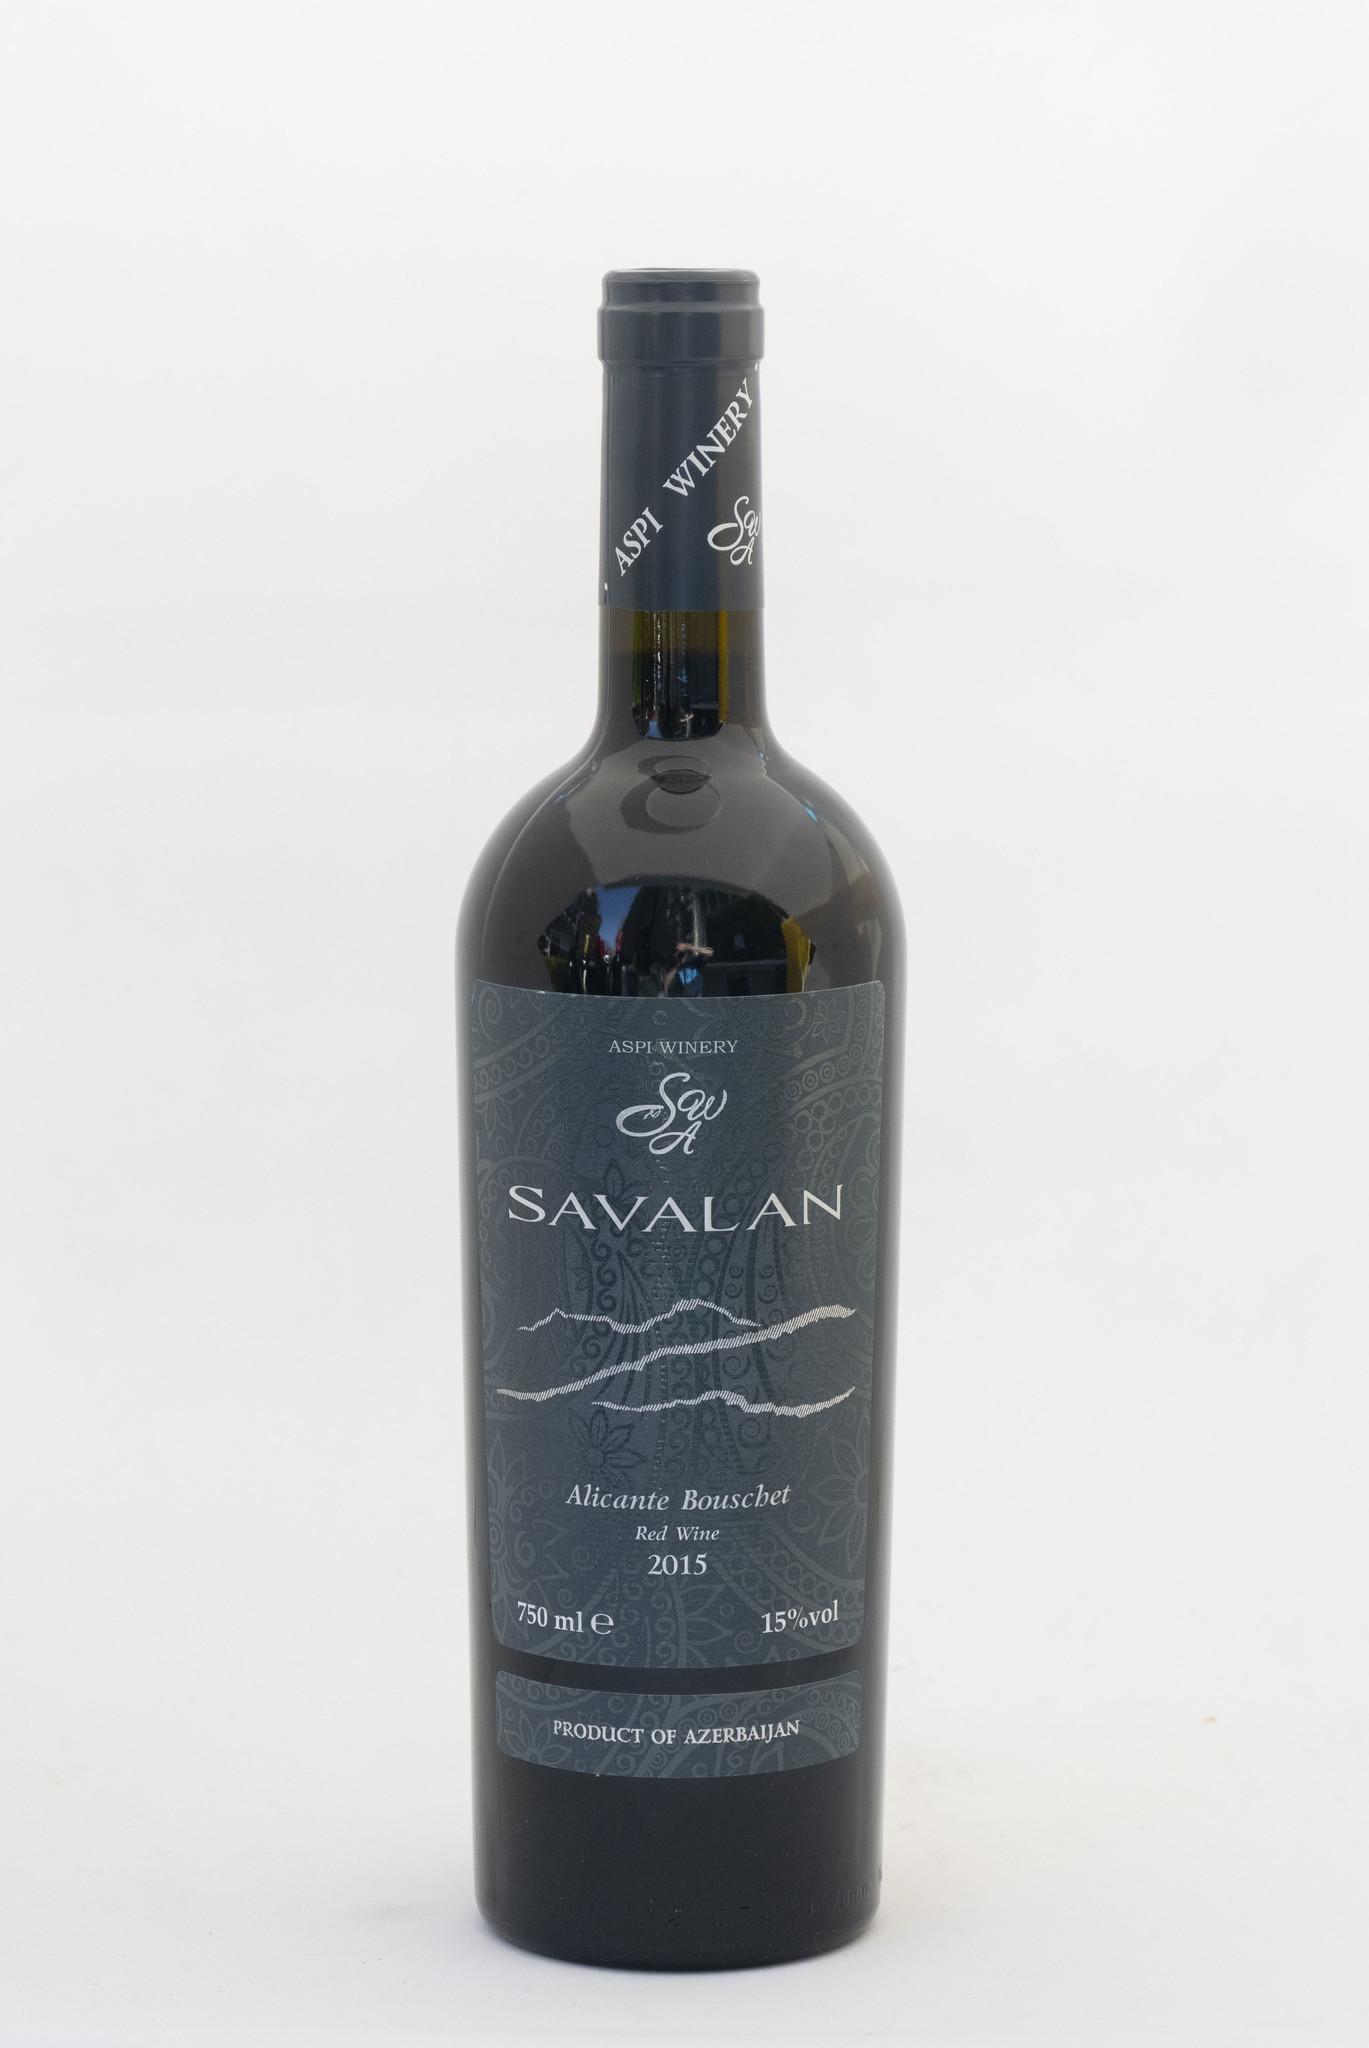 Savalan | Aspi Winery | Alicante bouschet | 2015